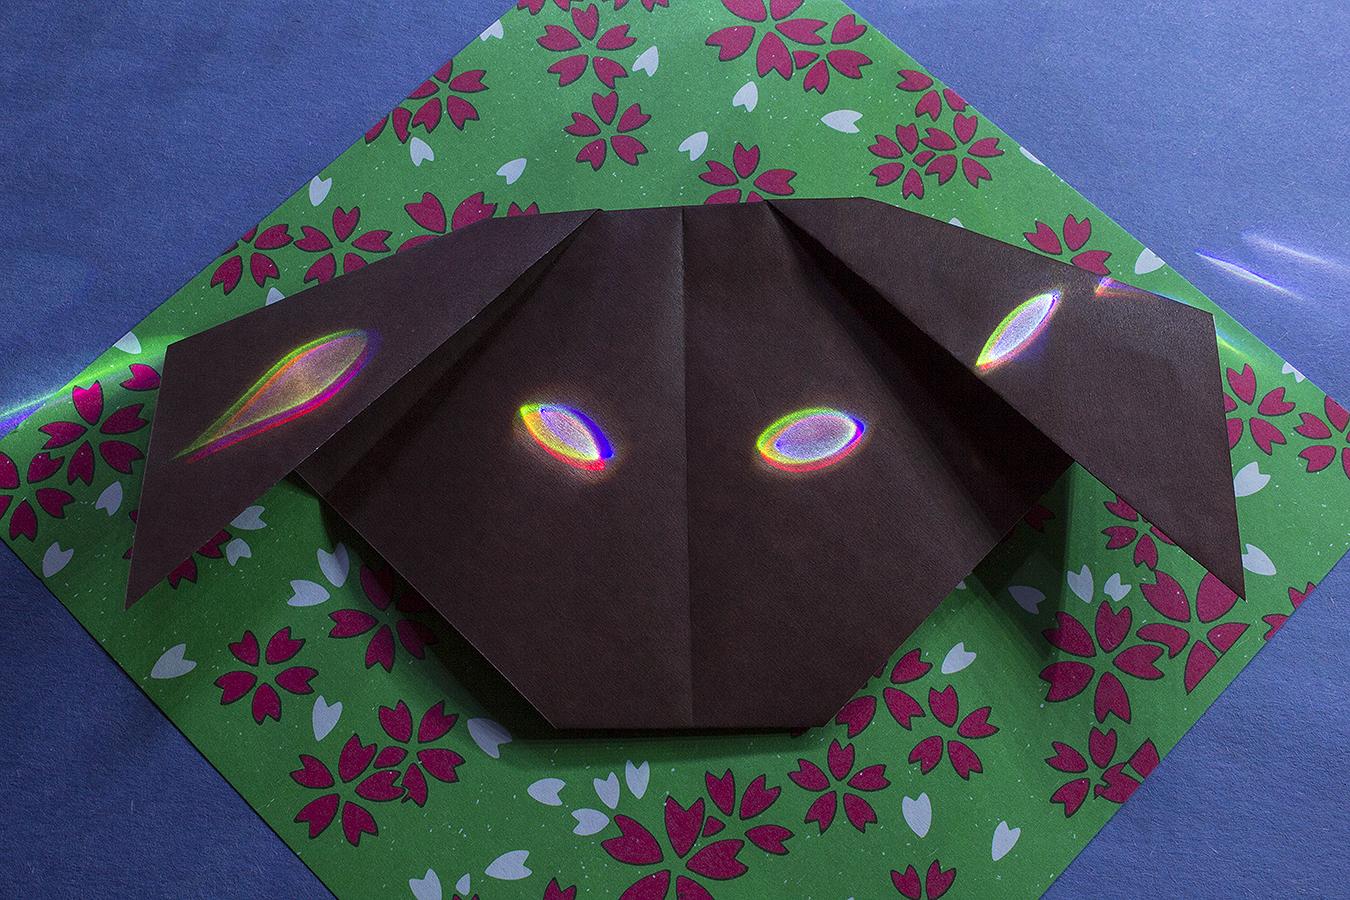 5_Dog_Jonathan_Tang_UPenn_Tony_Ward_Studio_Long_Exposure_Low_Light_LED_Optics_Origami_Paper